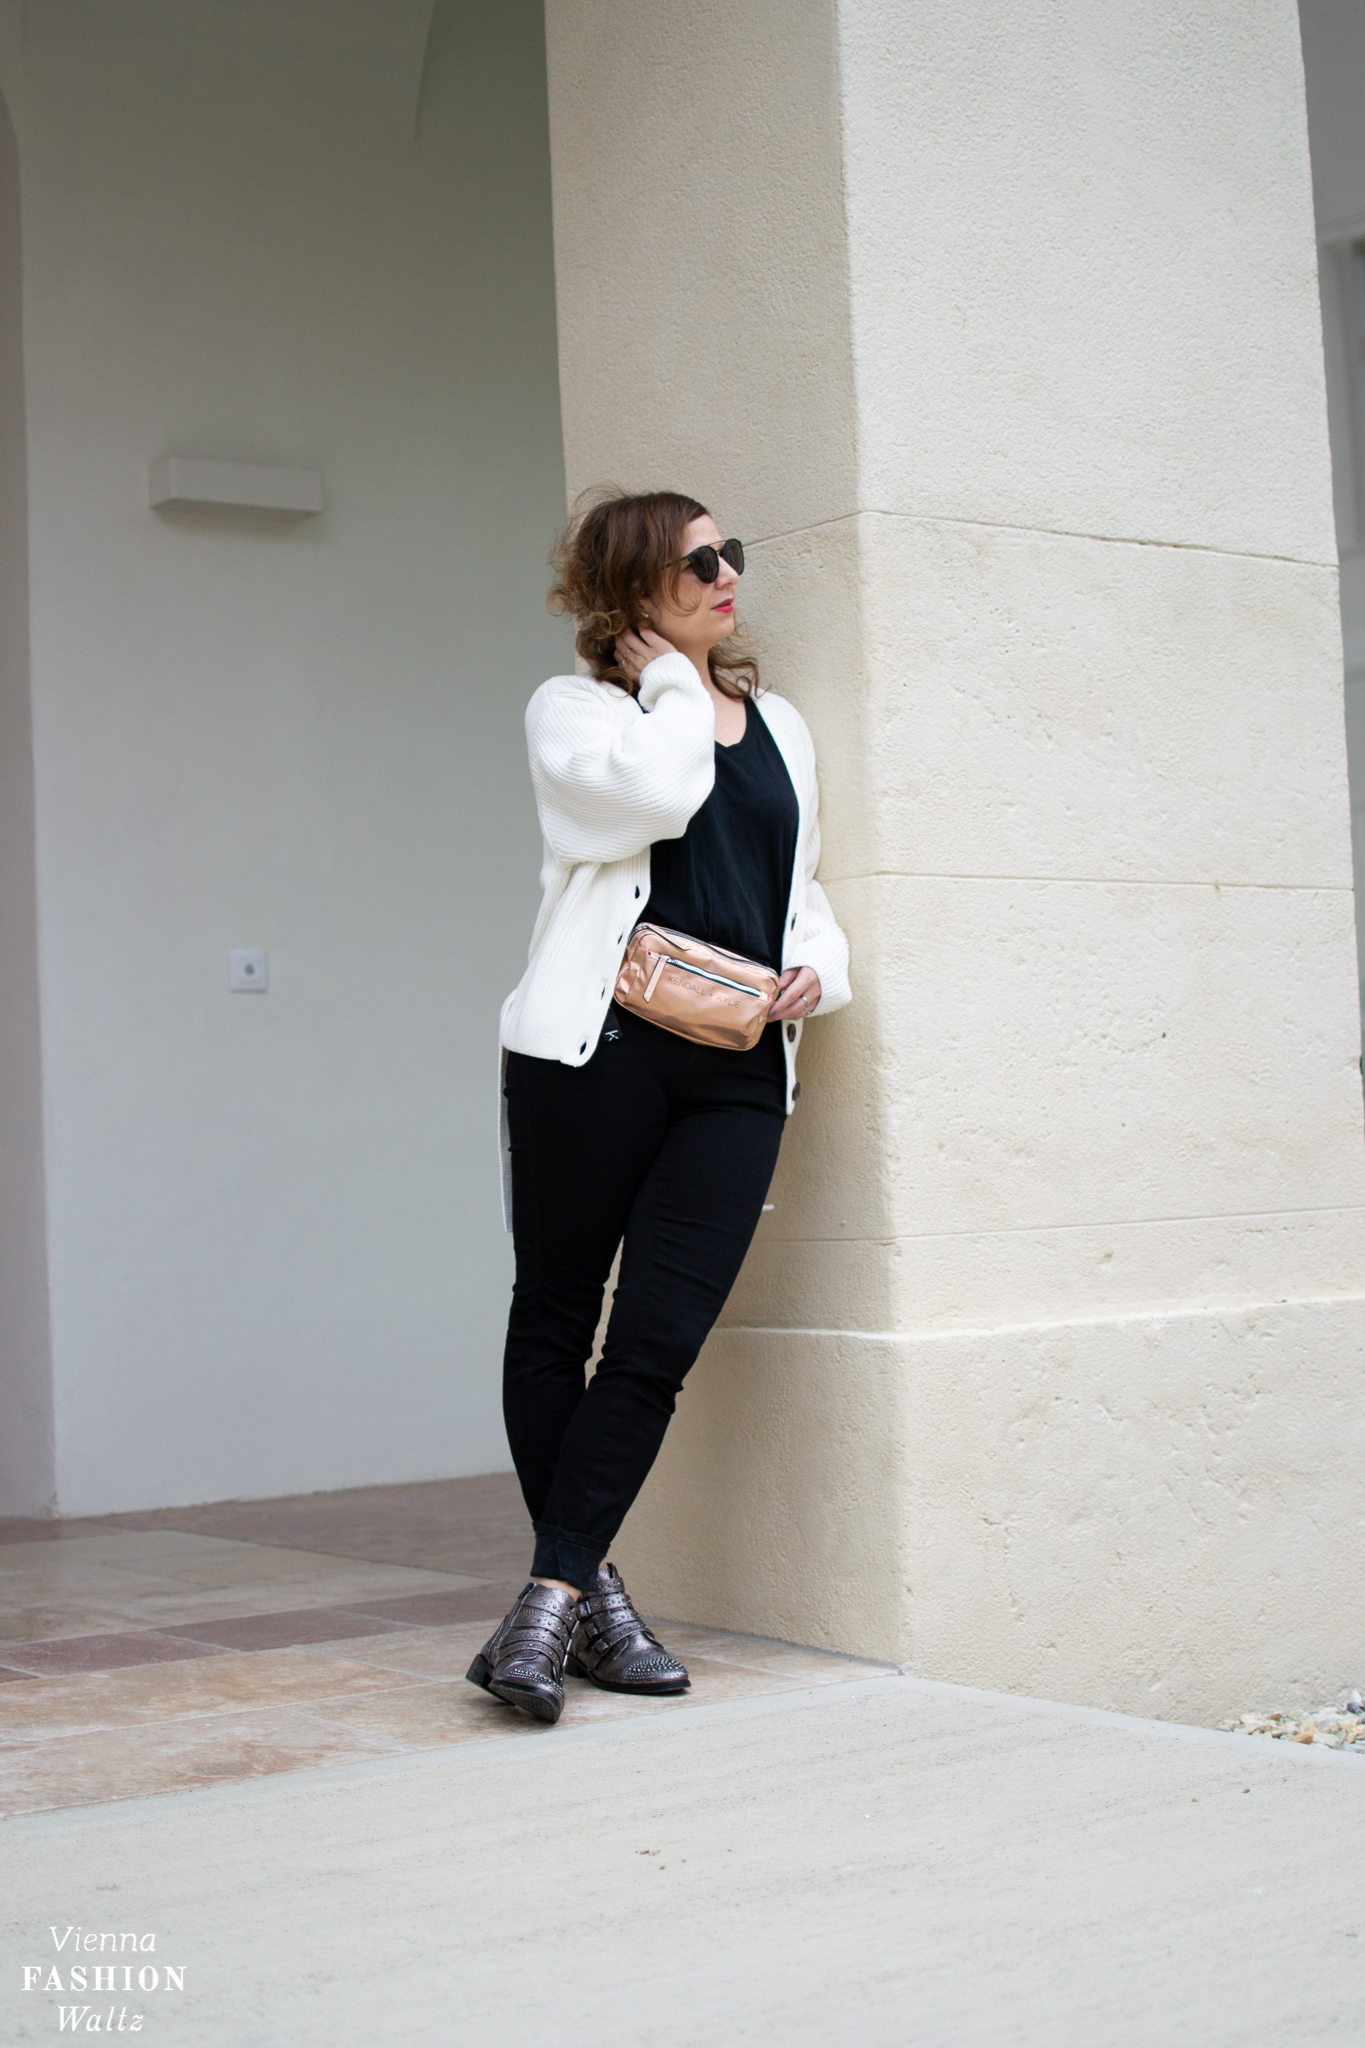 Fashionblog Influencer &otherstories boxycardigan Deichmann Boots Closed Jeans Vienna Fashion Waltz